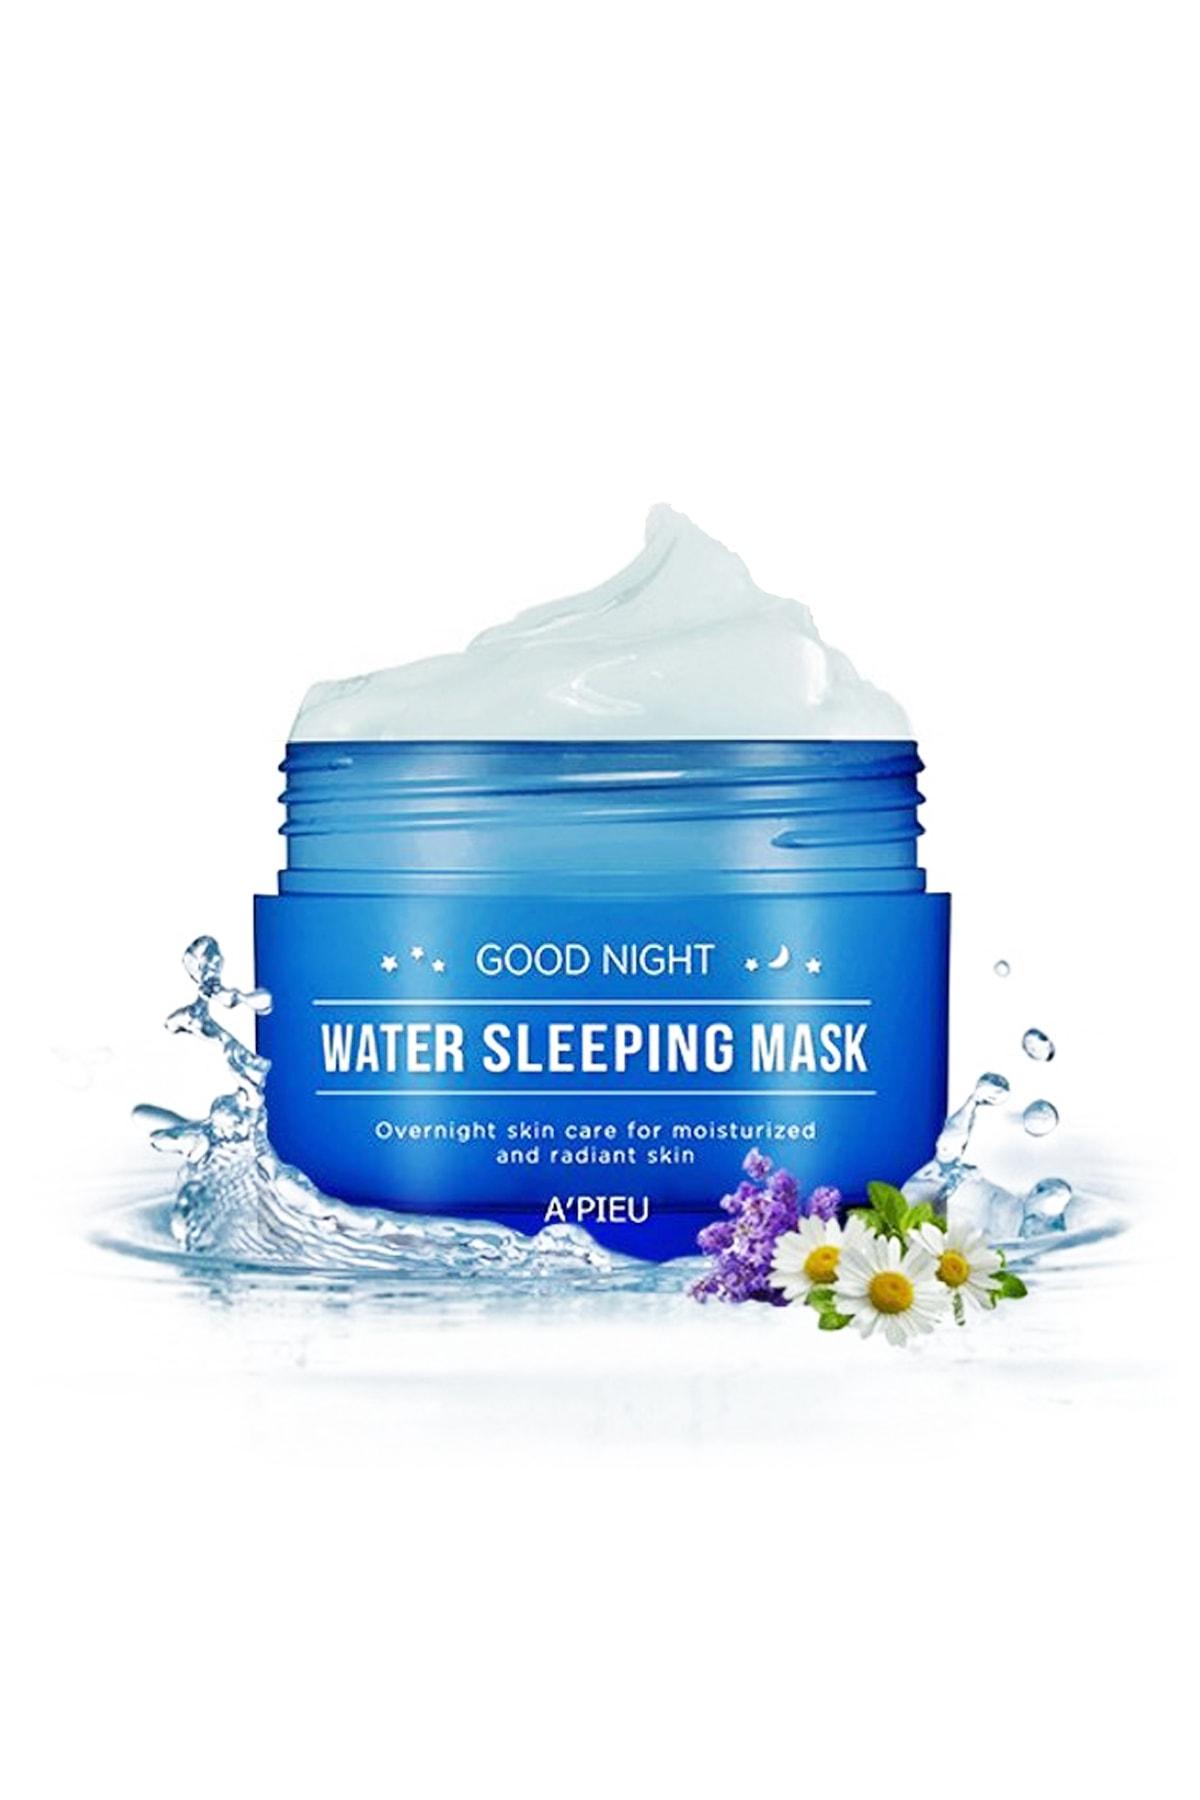 Missha Nemlendirici Gece Uyku Maskesi 105ml APIEU Good Night Water Sleeping Mask